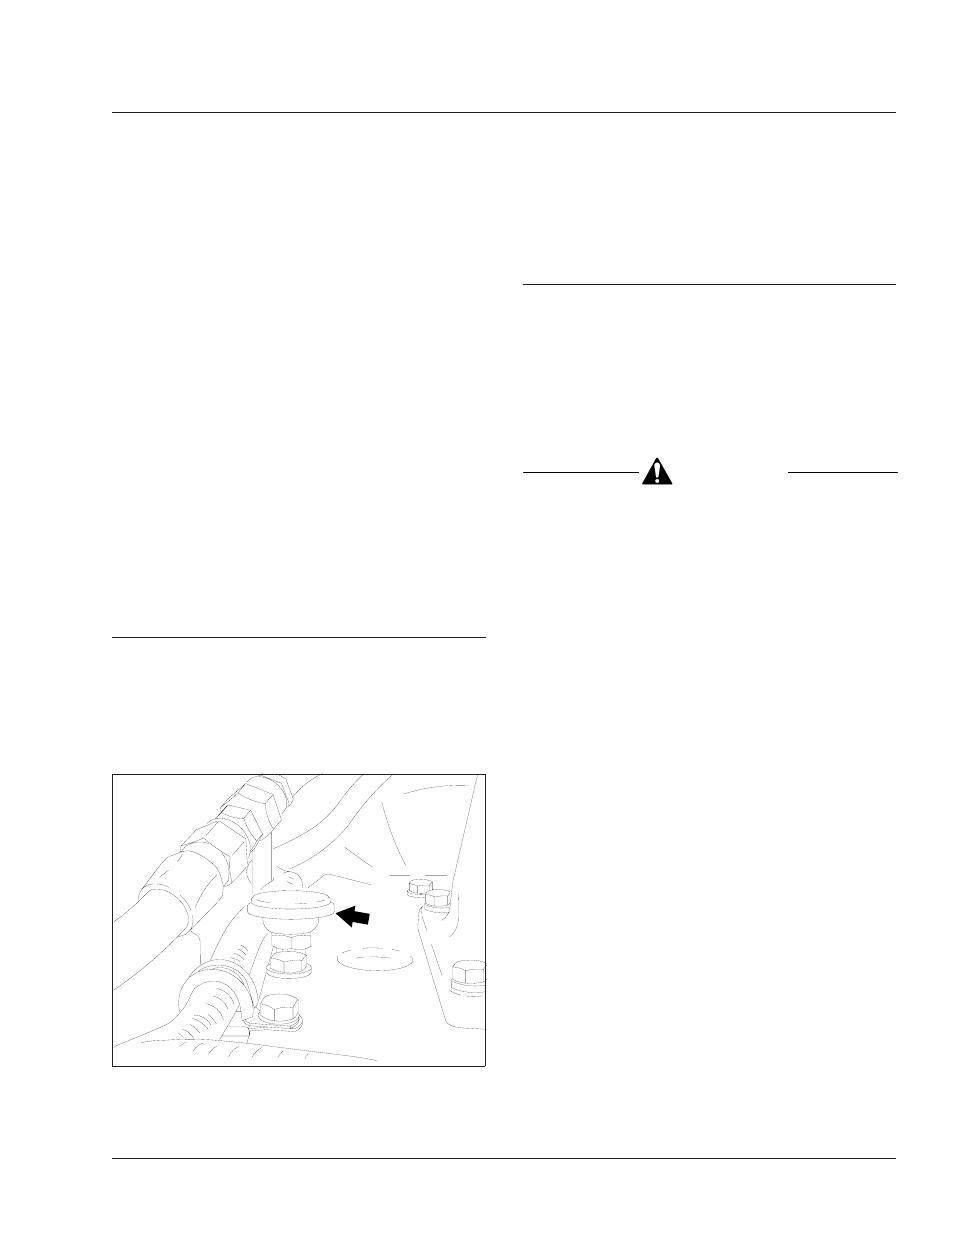 Allison transmission breather checking, Allison transmission fluid and  filter changing, Transmission | 26–